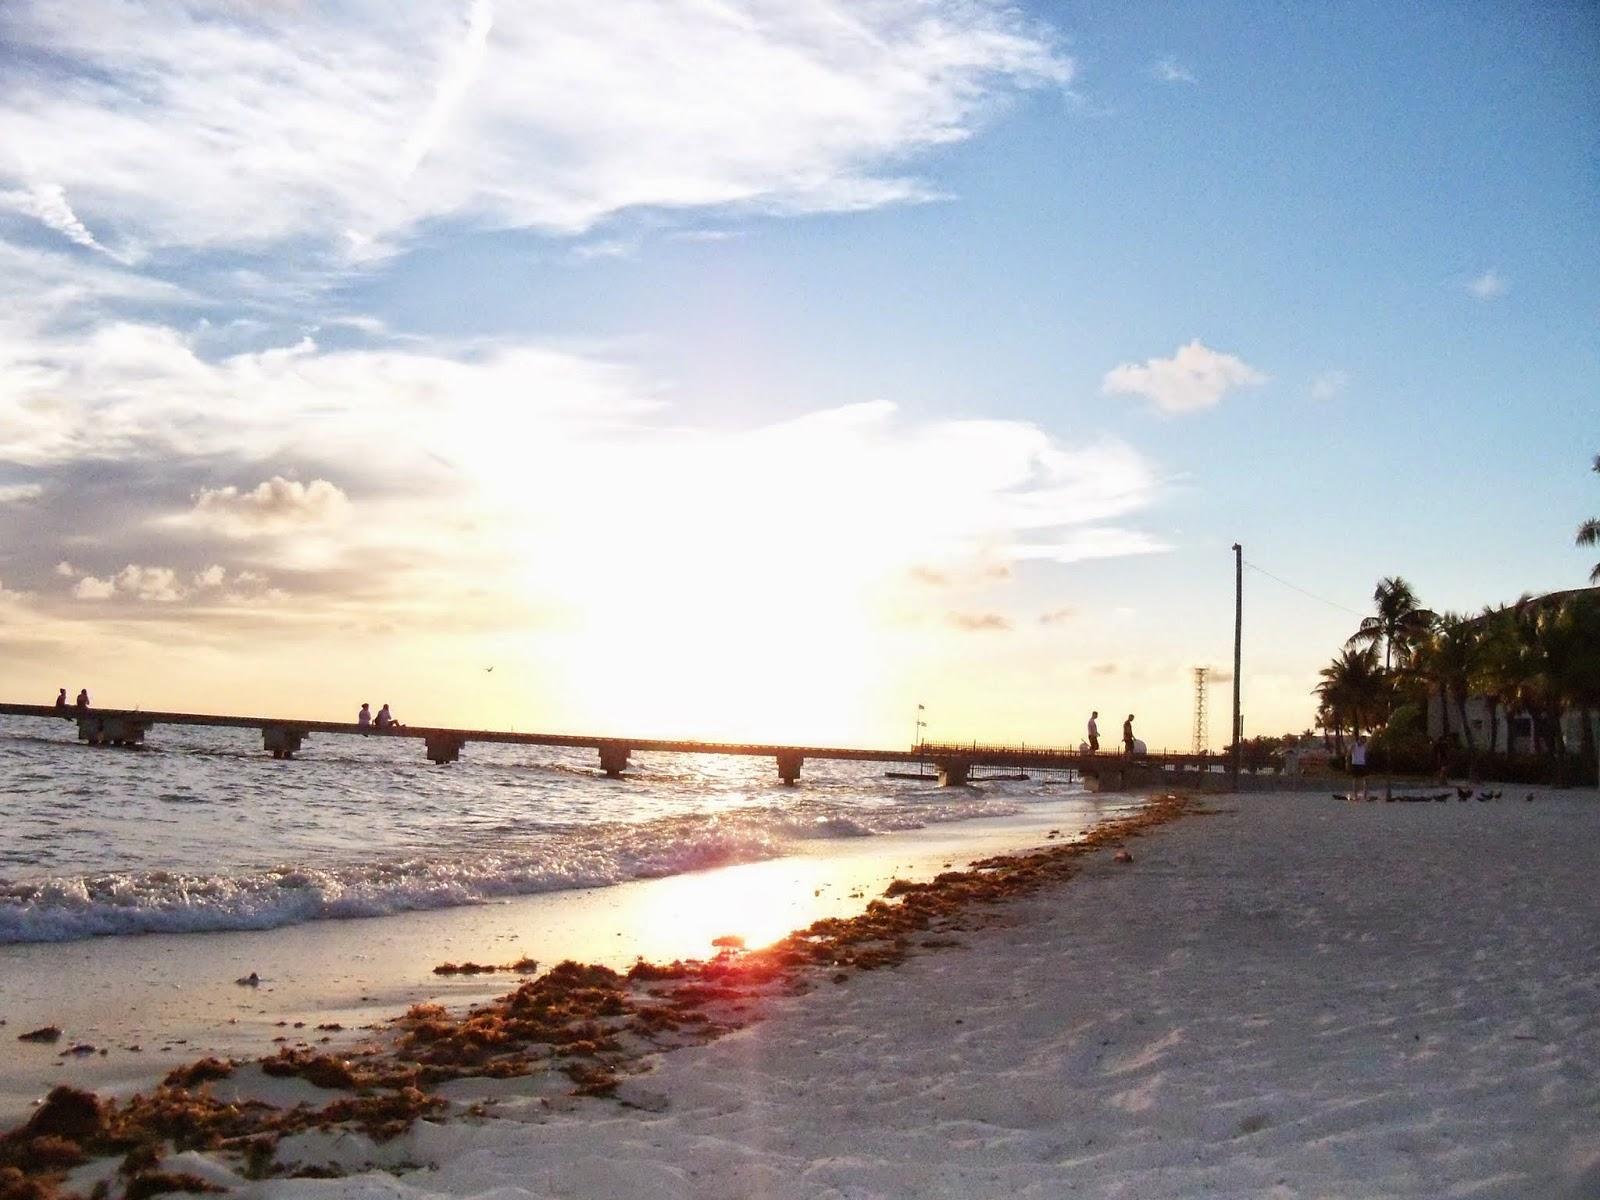 Key West Vacation - 116_5545.JPG